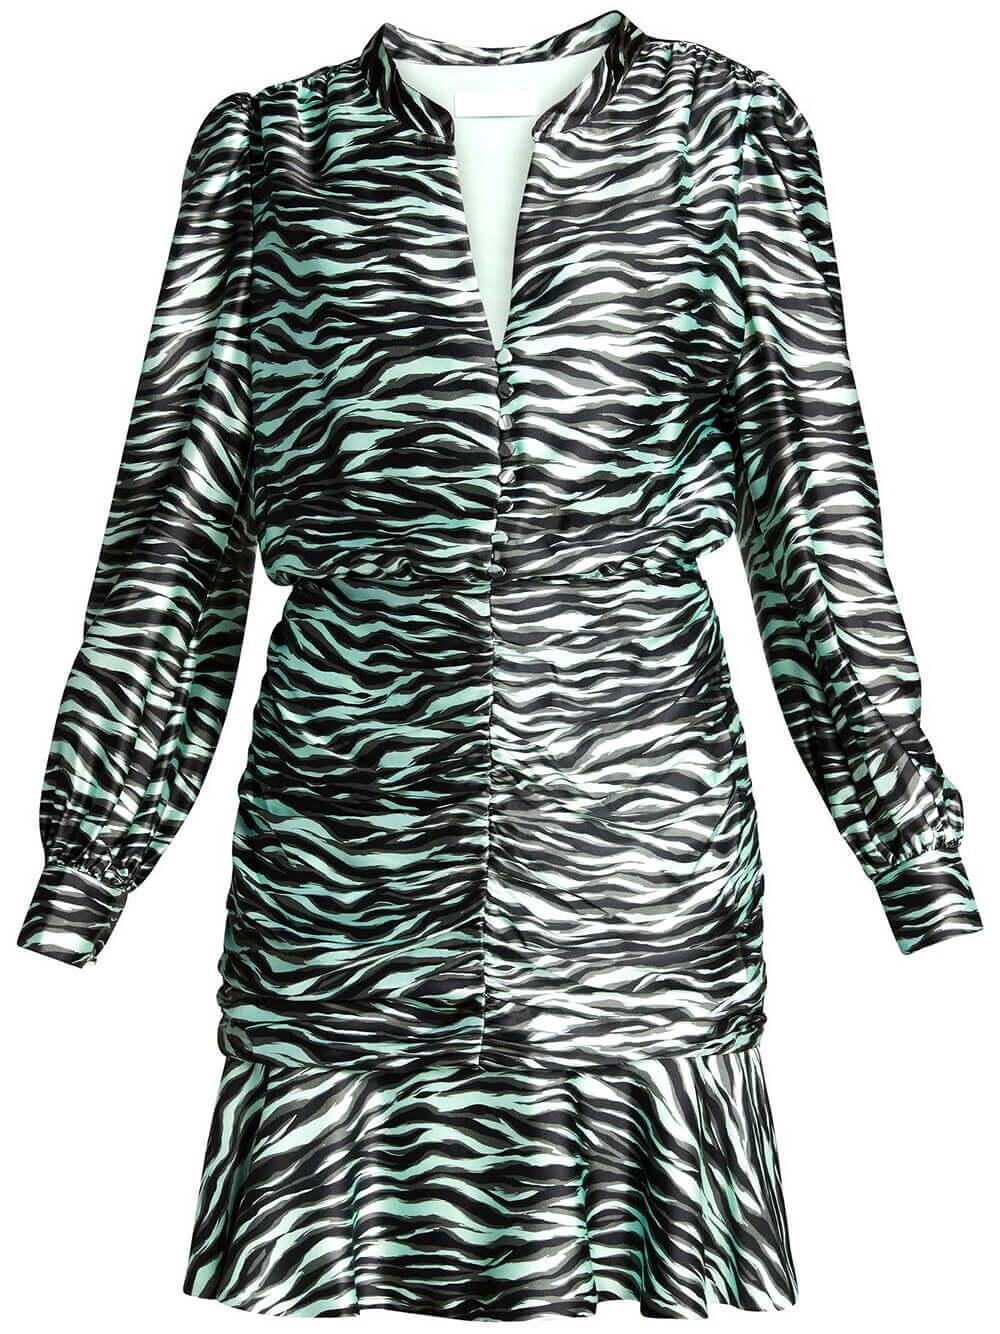 Saoirse Mini Dress Item # 121-1021-A